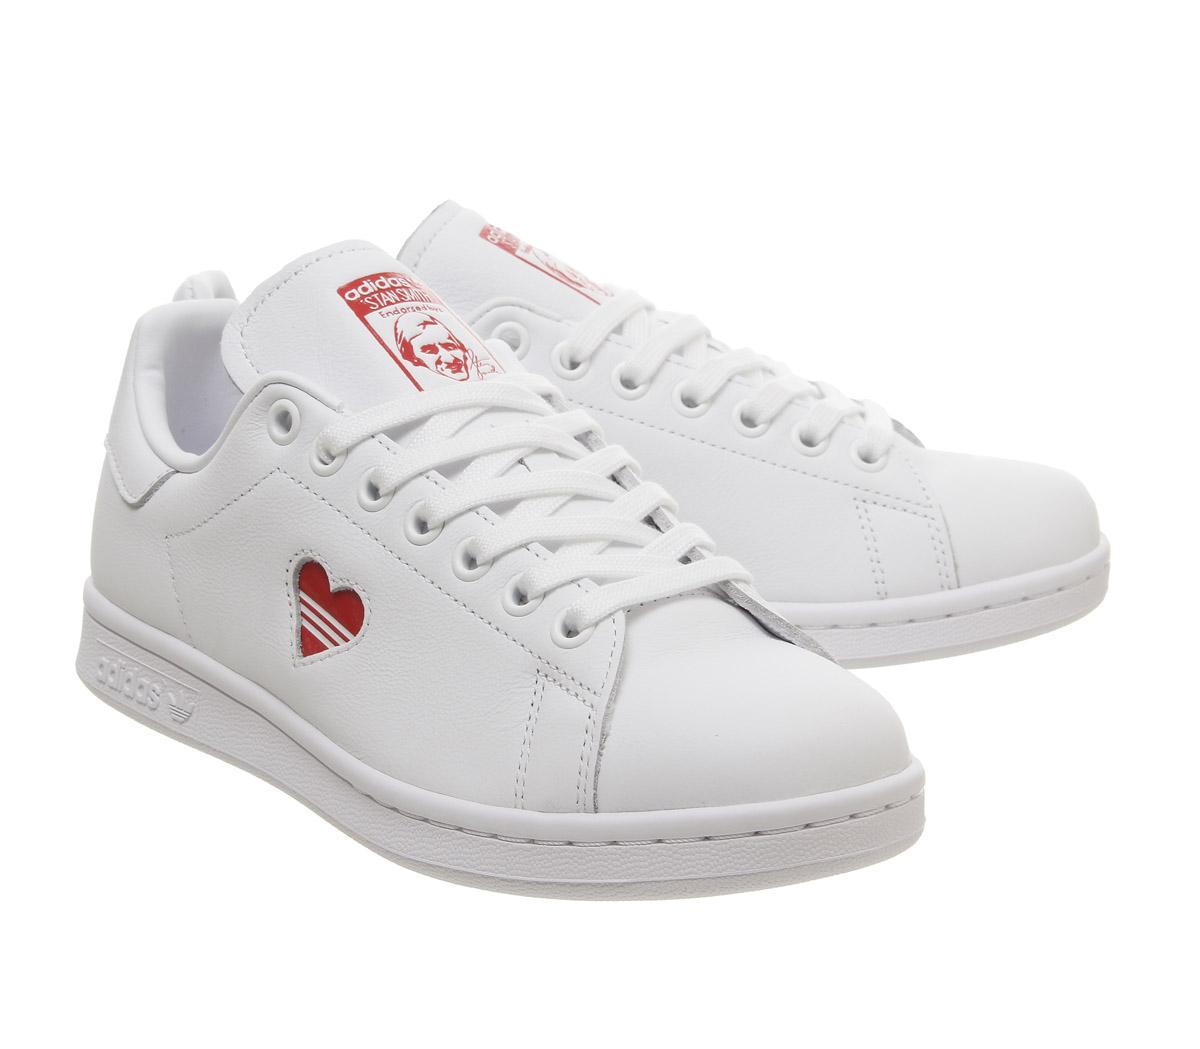 adidas Stan Smith Red Heart Valentine's